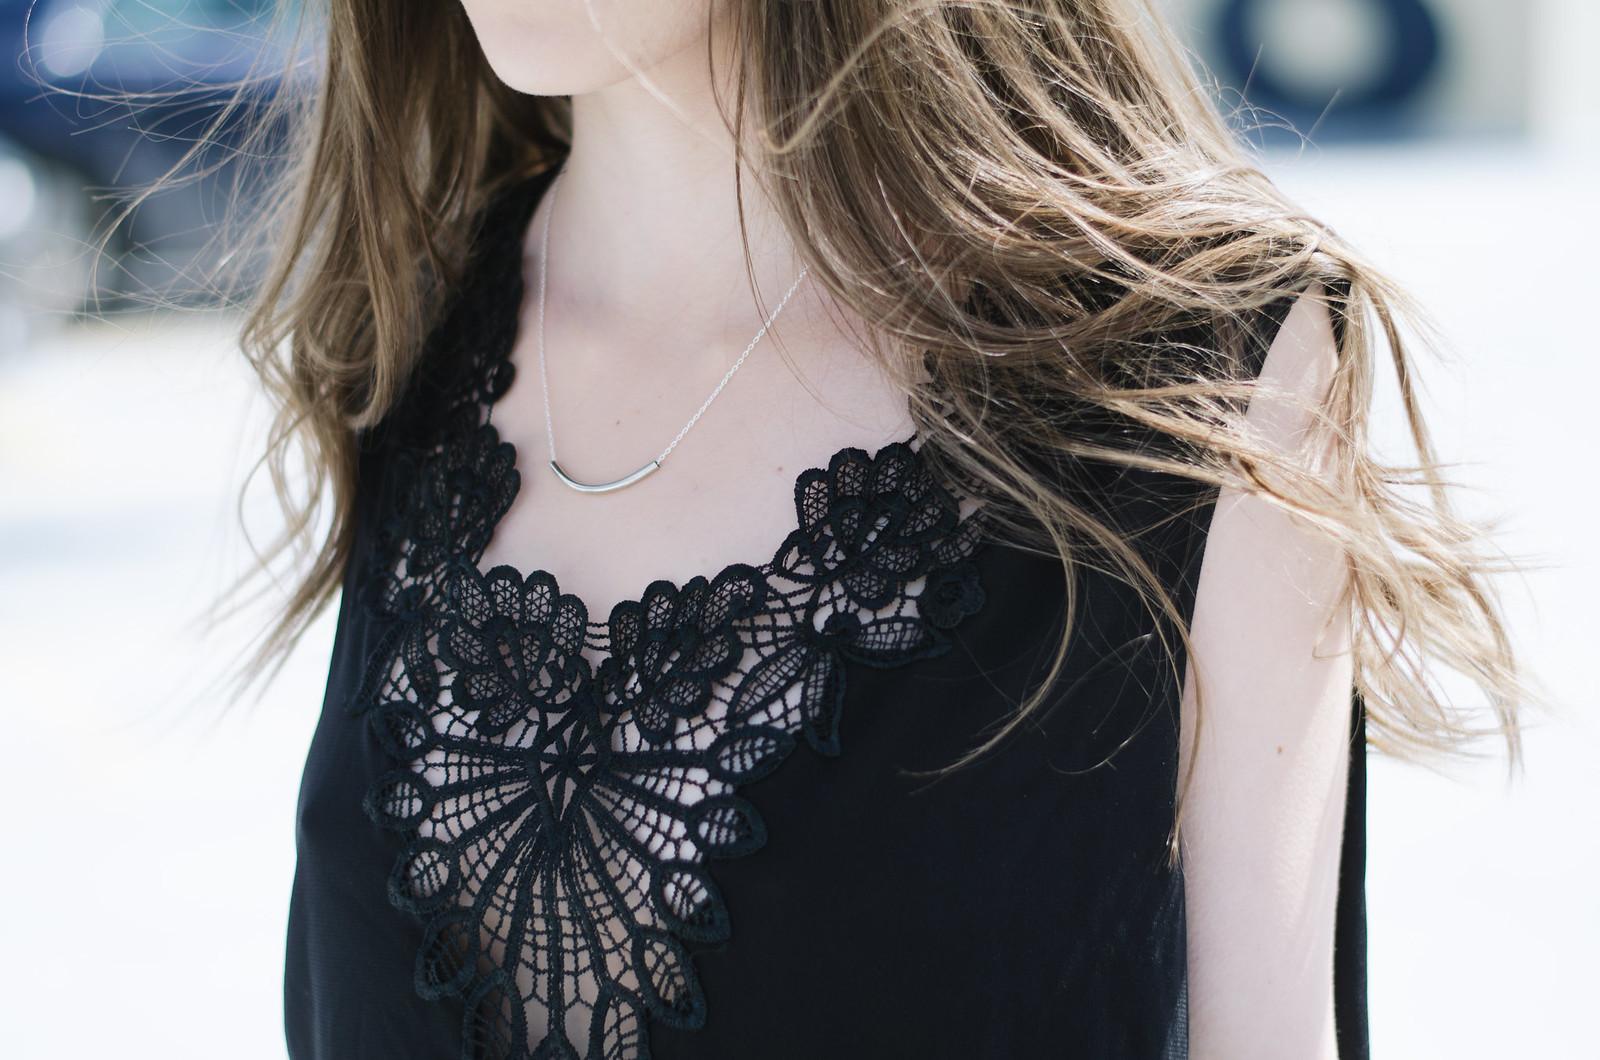 Jaelle Applique Top and Bar Necklace on juliettelaura.blogspot.com